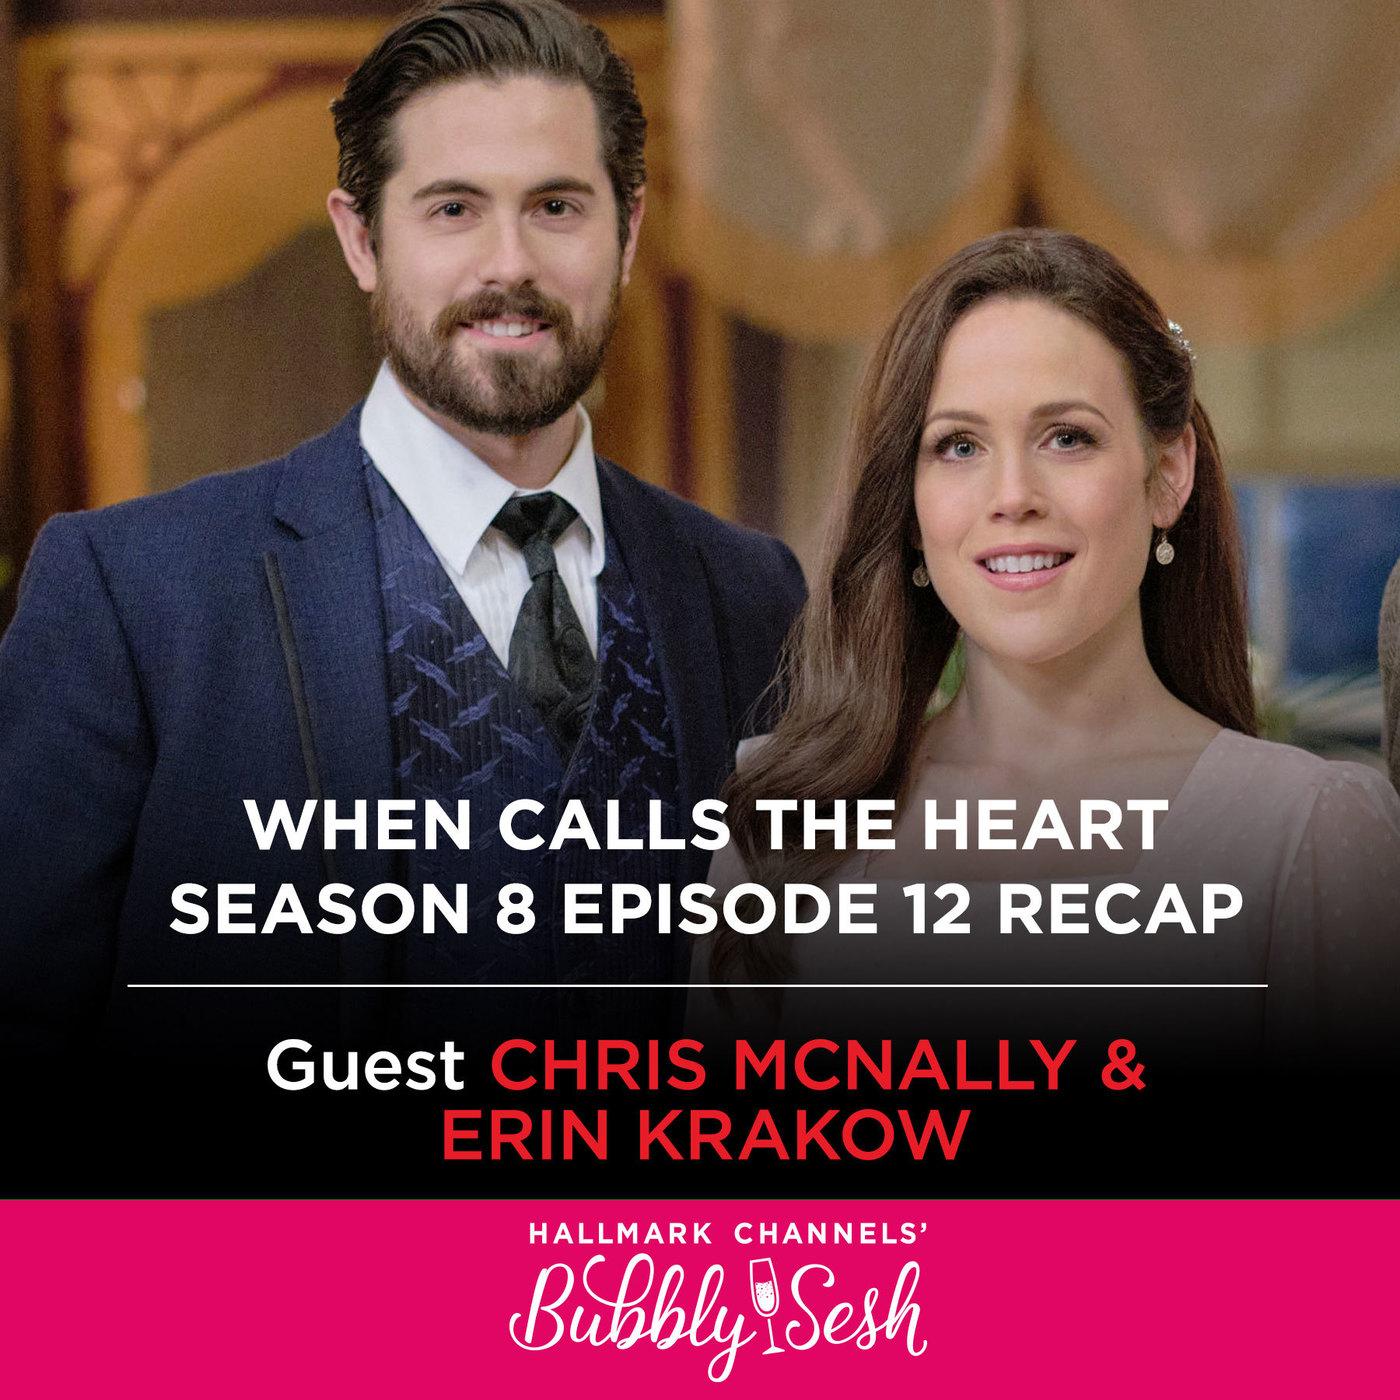 When Calls the Heart S8 Ep 12 Recap with Chris McNally  and Erin Krakow